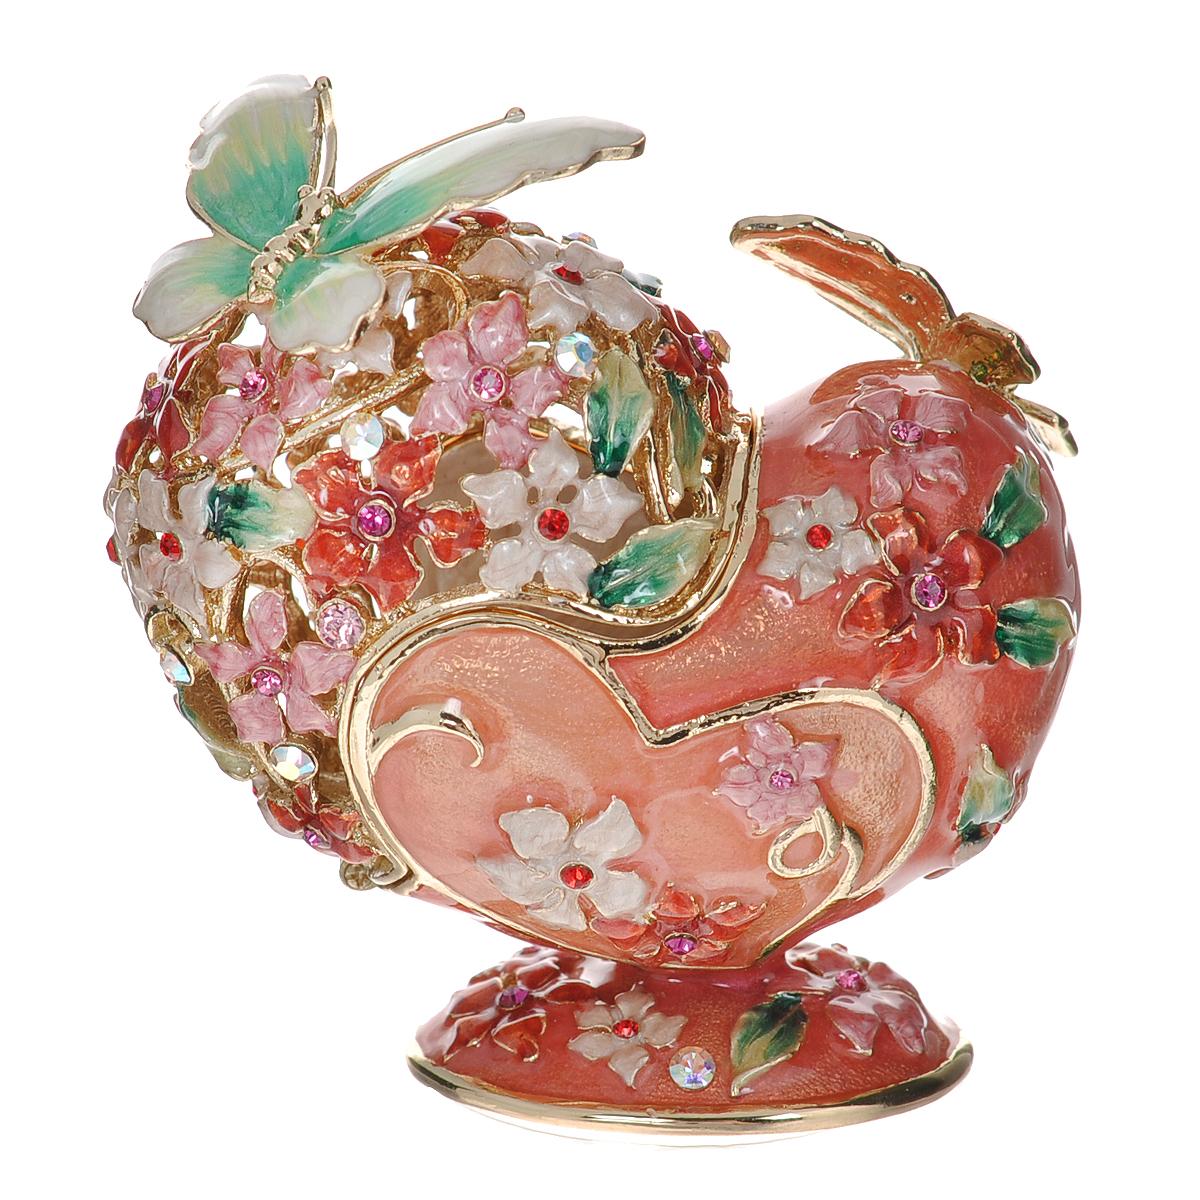 Шкатулка Сердце, цвет: розовый, 6 х 3,5 х 6,5 см 64122 свеча декоративная win max с днем рождения цвет розовый 6 х 6 х 8 см